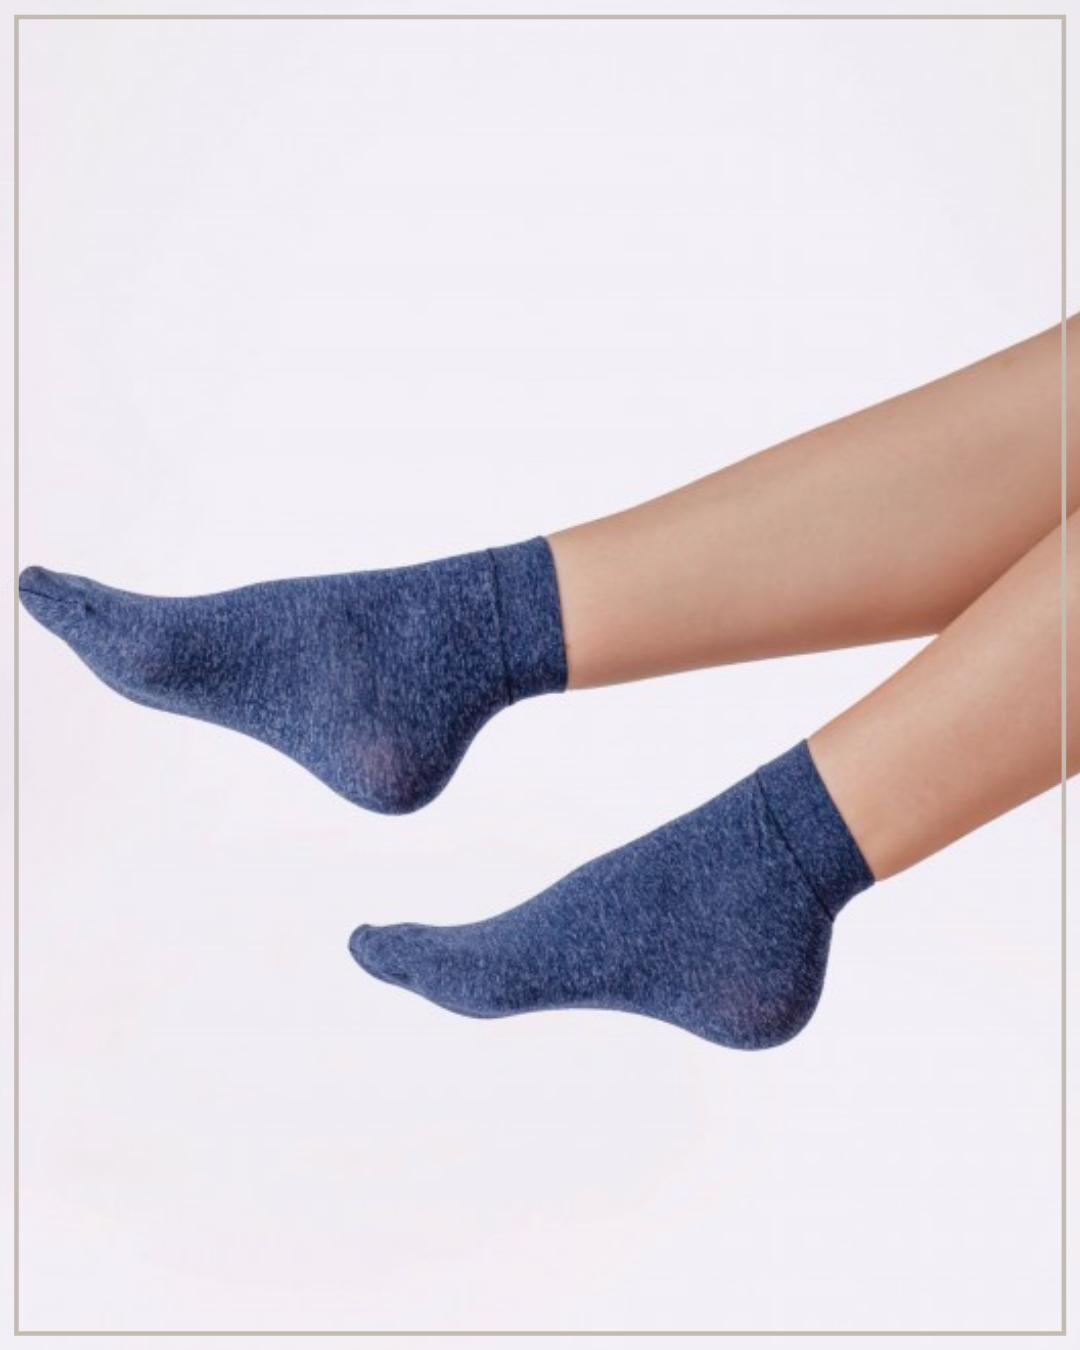 60 den mėlynos, melanžinės kojinaitės, 2 poros